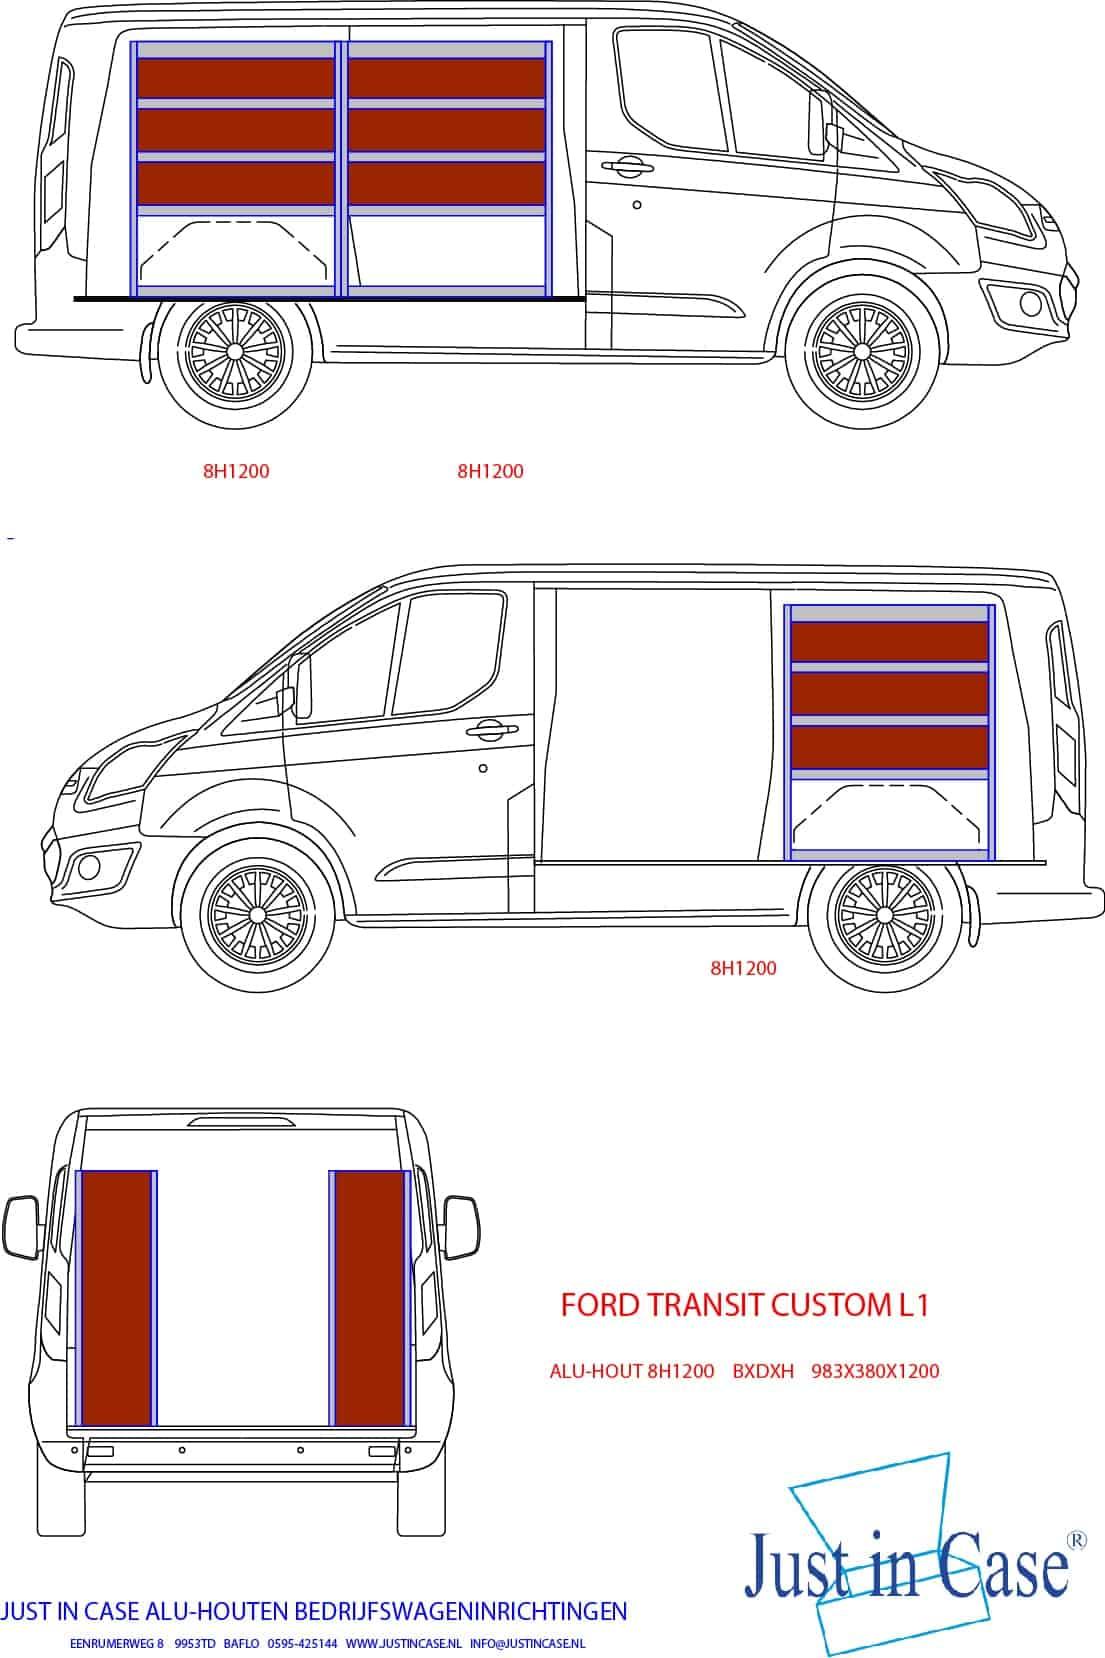 Ford Transit Custom bedrijfsbus inrichten